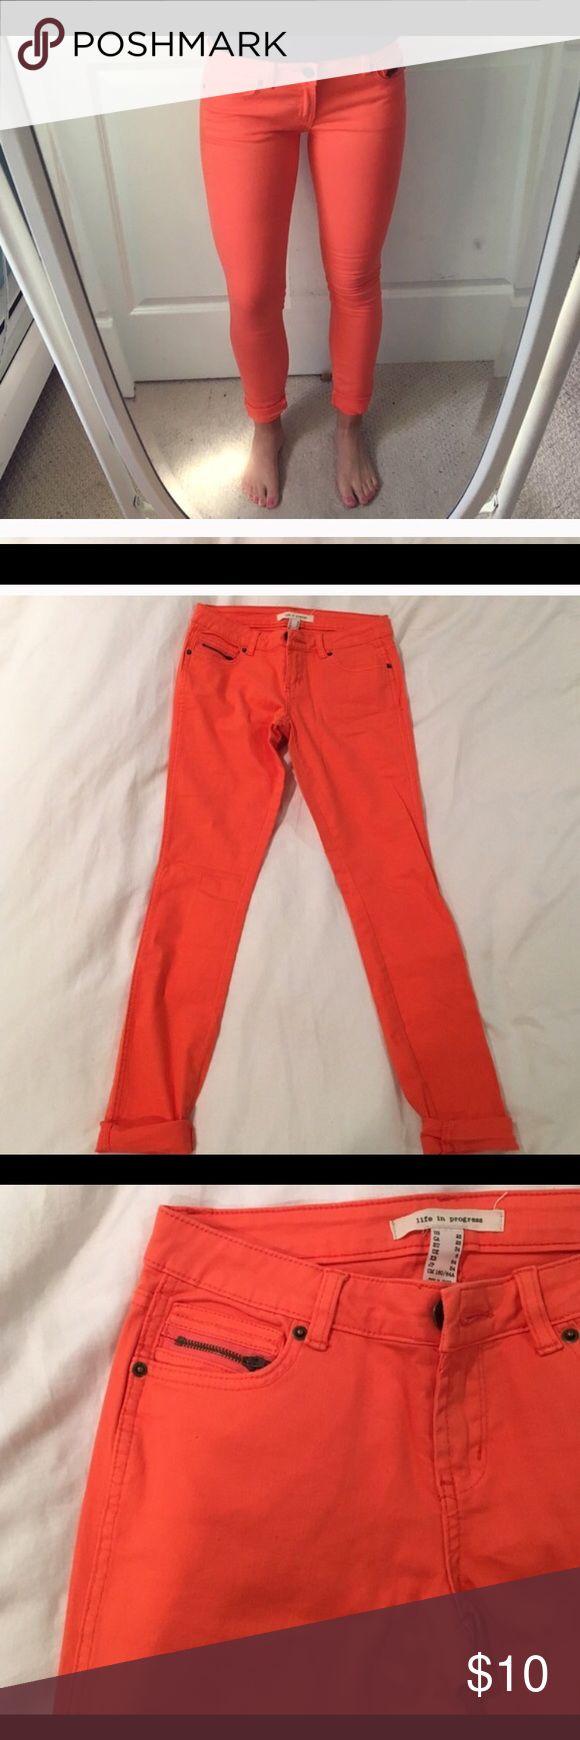 Life in progress orange skinny jeans Super cute  soft light denim orange skinnies! Forever 21 Jeans Skinny